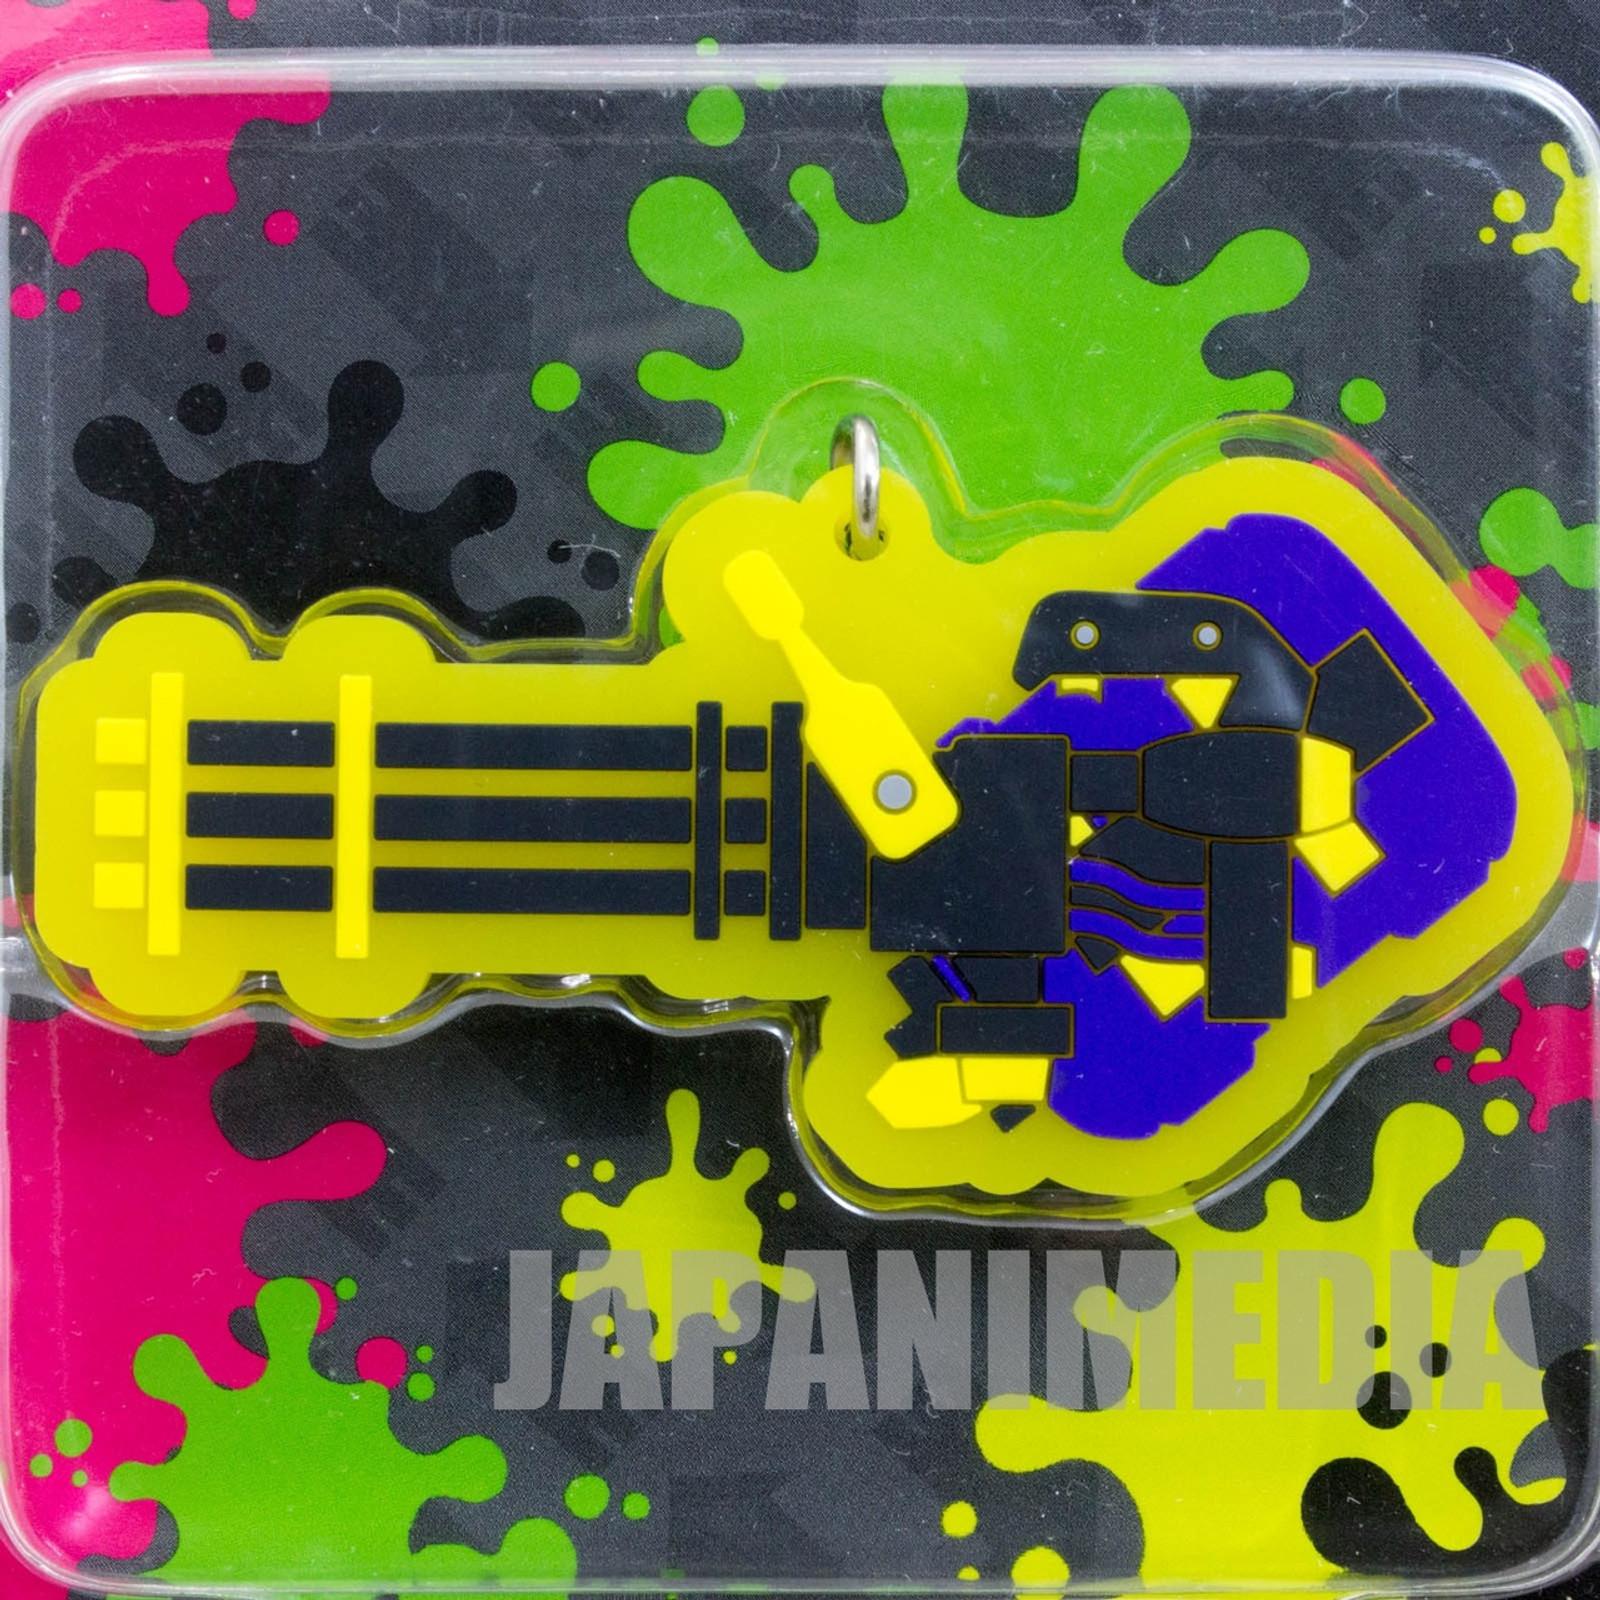 Splatoon 2 Heavy Splatling Rubber Charm Collection JAPAN Nintendo Switch